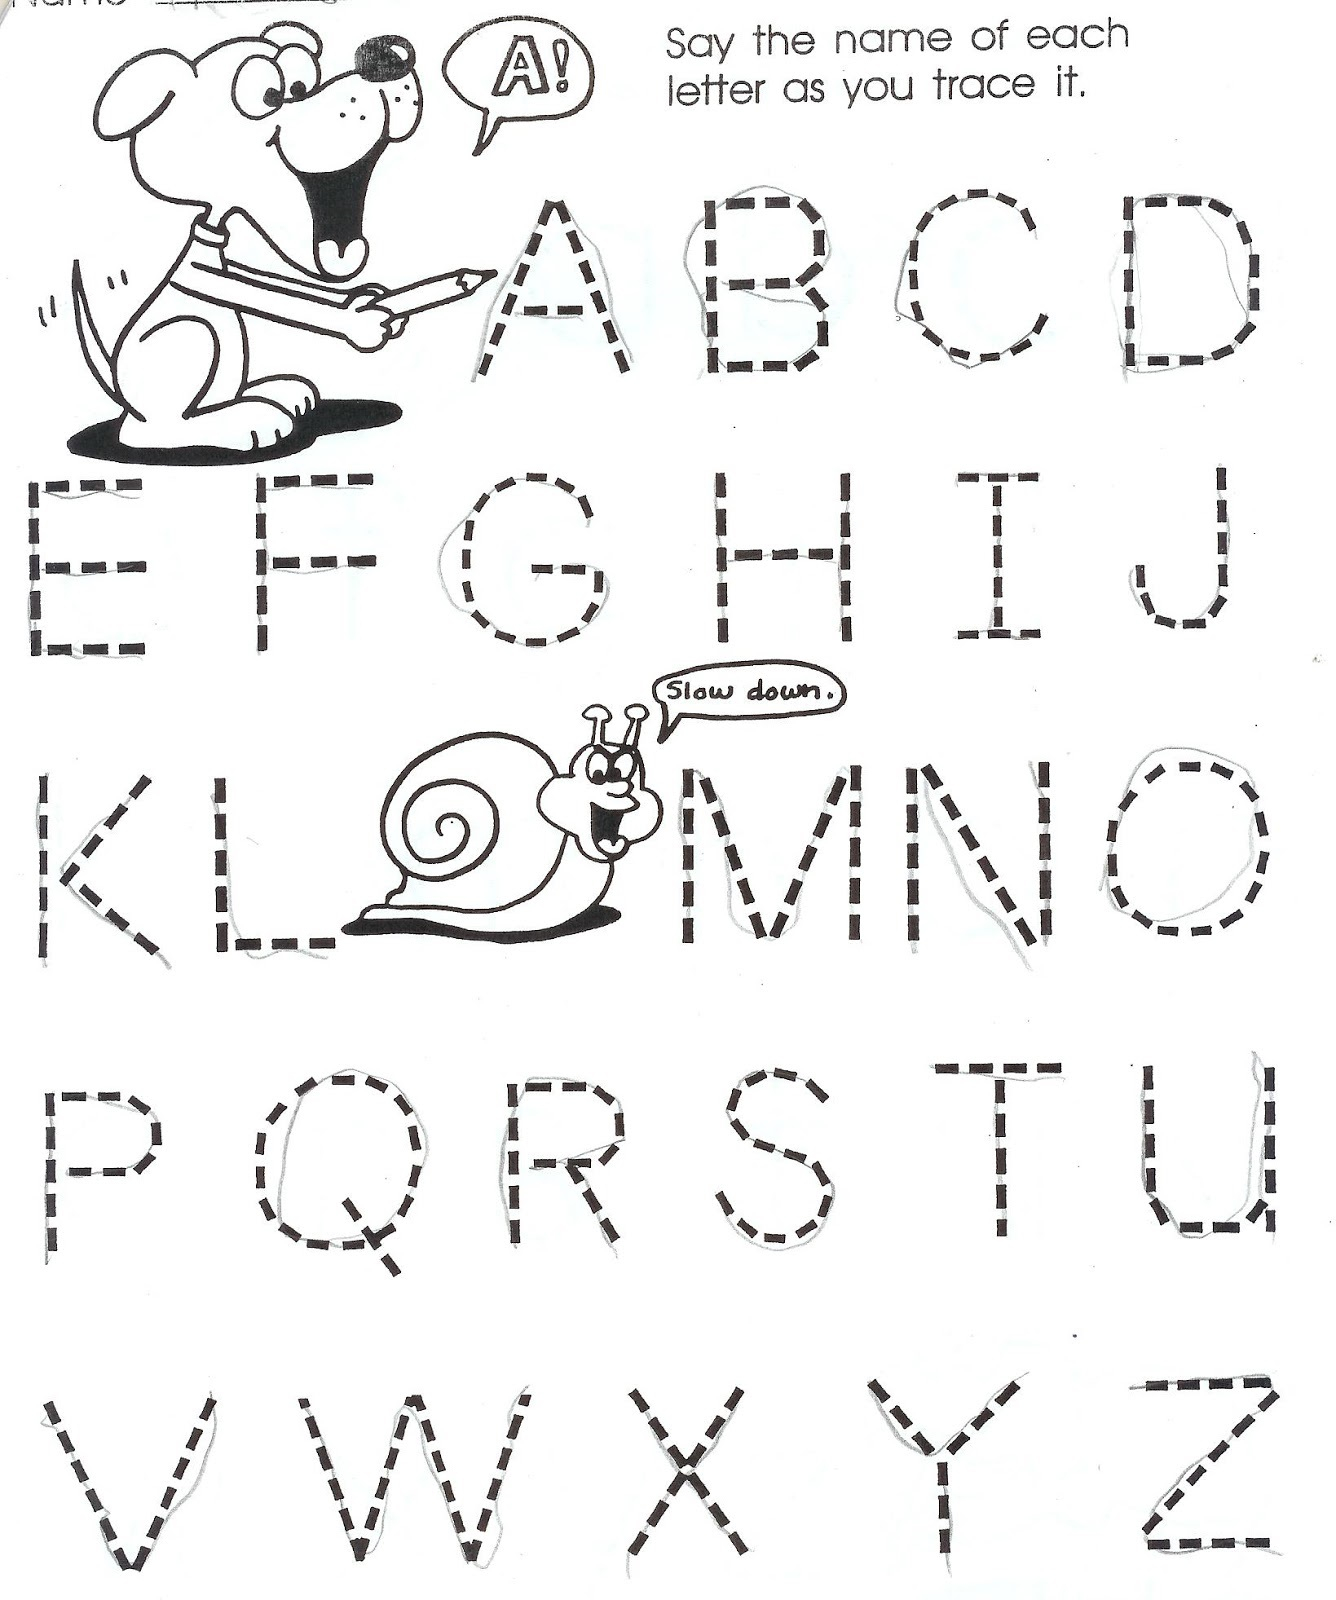 Number Tracing Worksheets Year Old Printable – Kingandsullivan